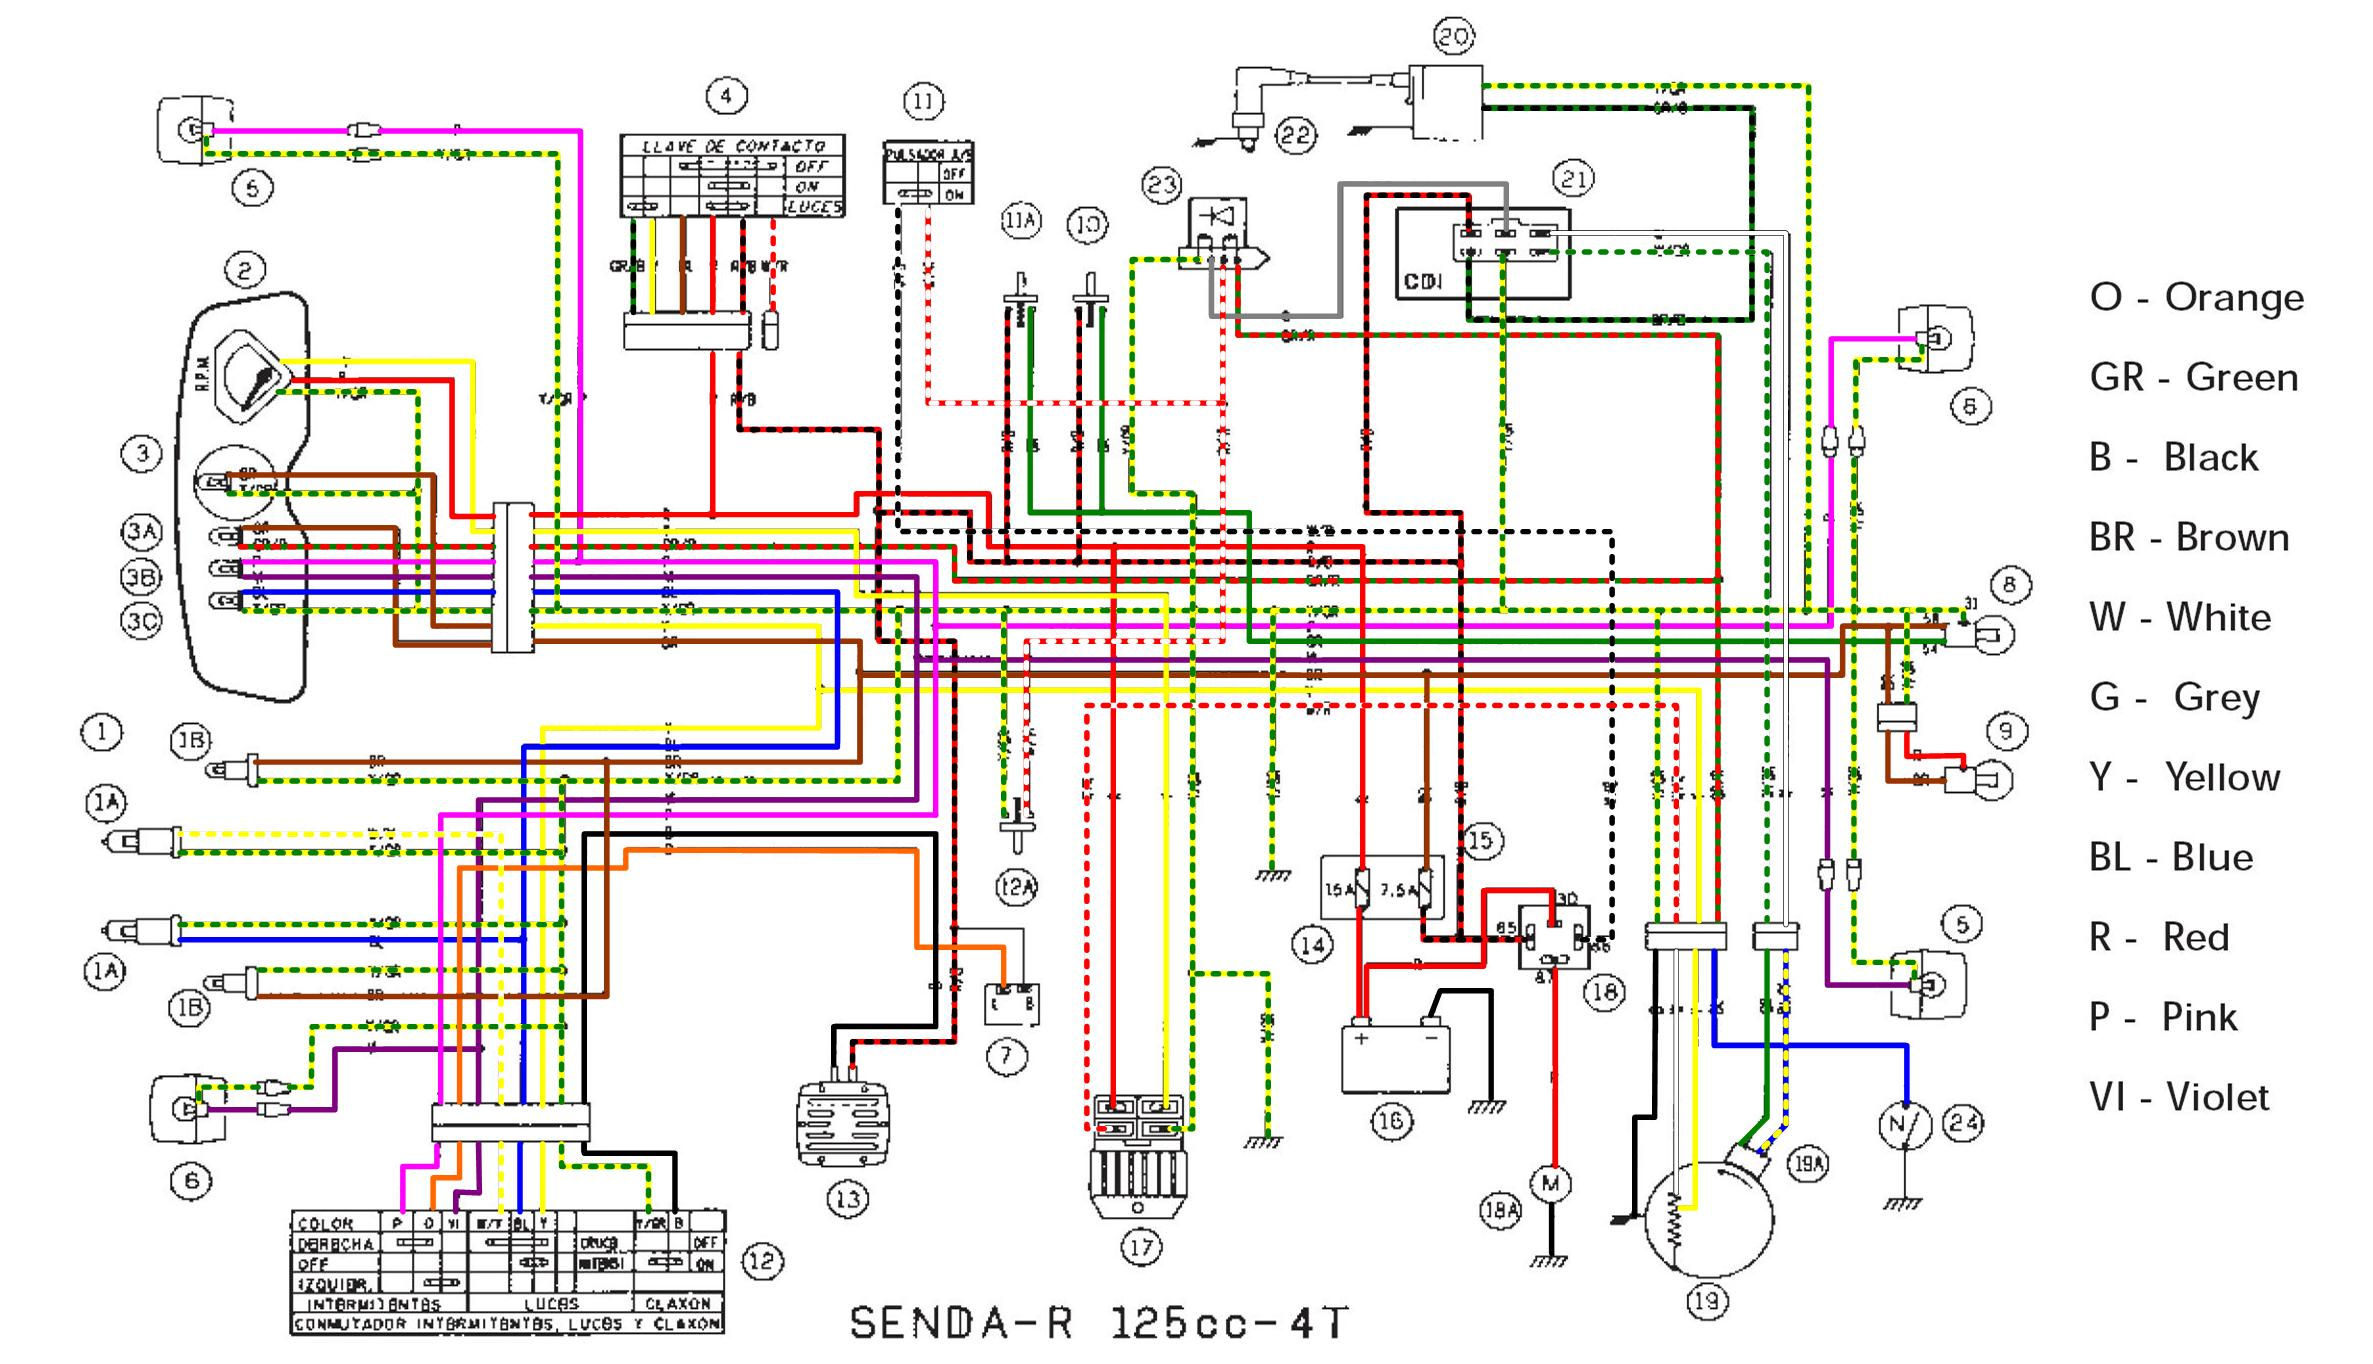 Схема электрооборудования мотоциклов Derbi Senda R 125 4T